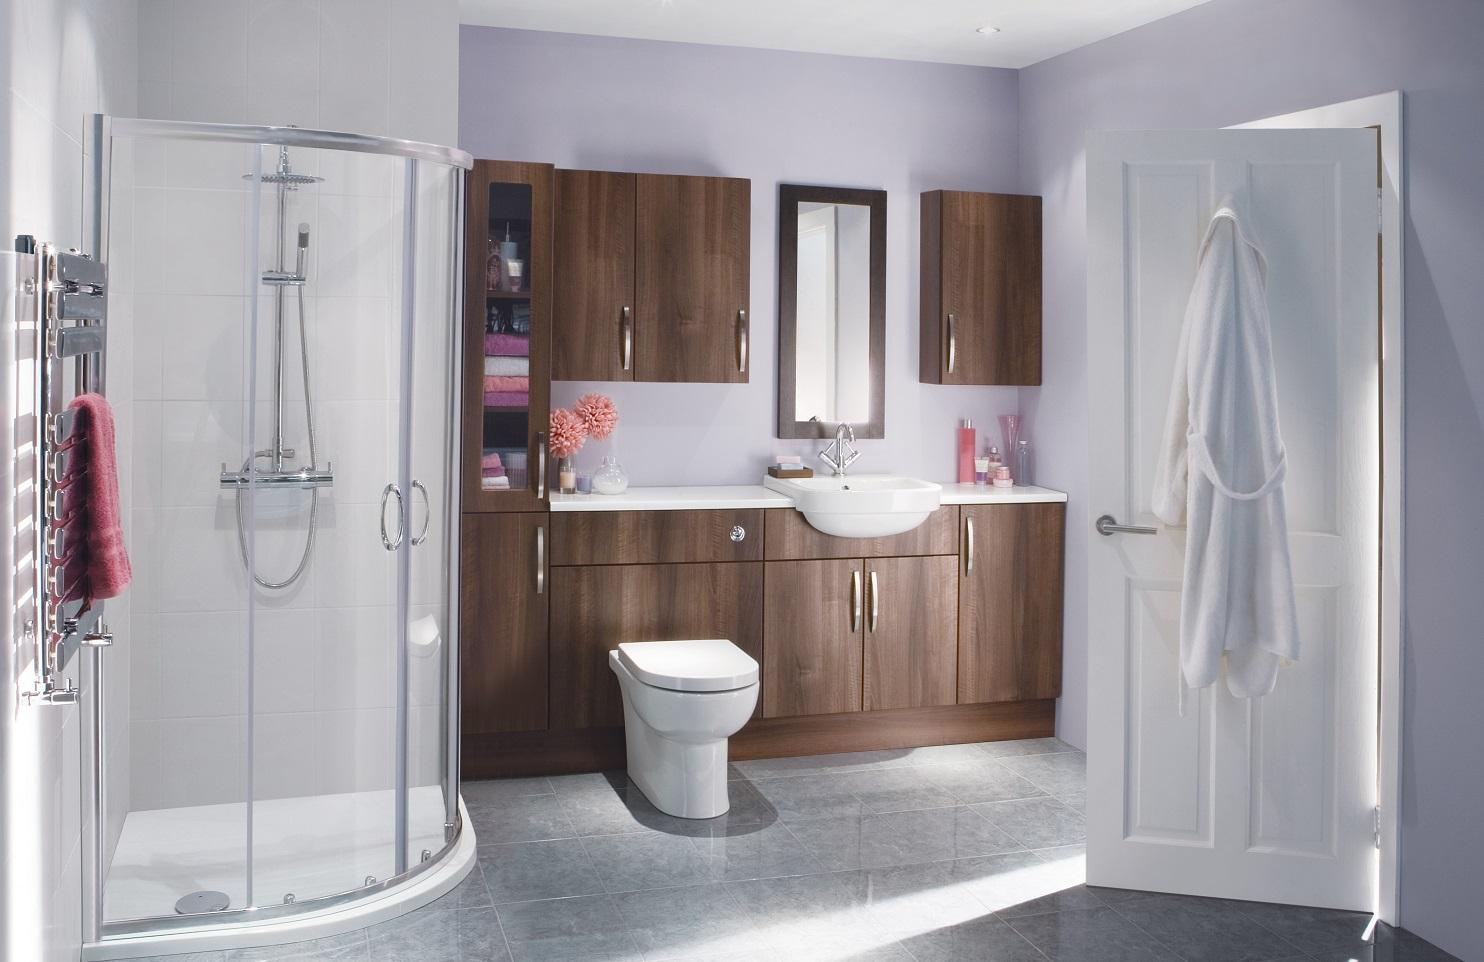 Modern Bathroom With Walnut Furniture And Quadrant Shower Enclosure